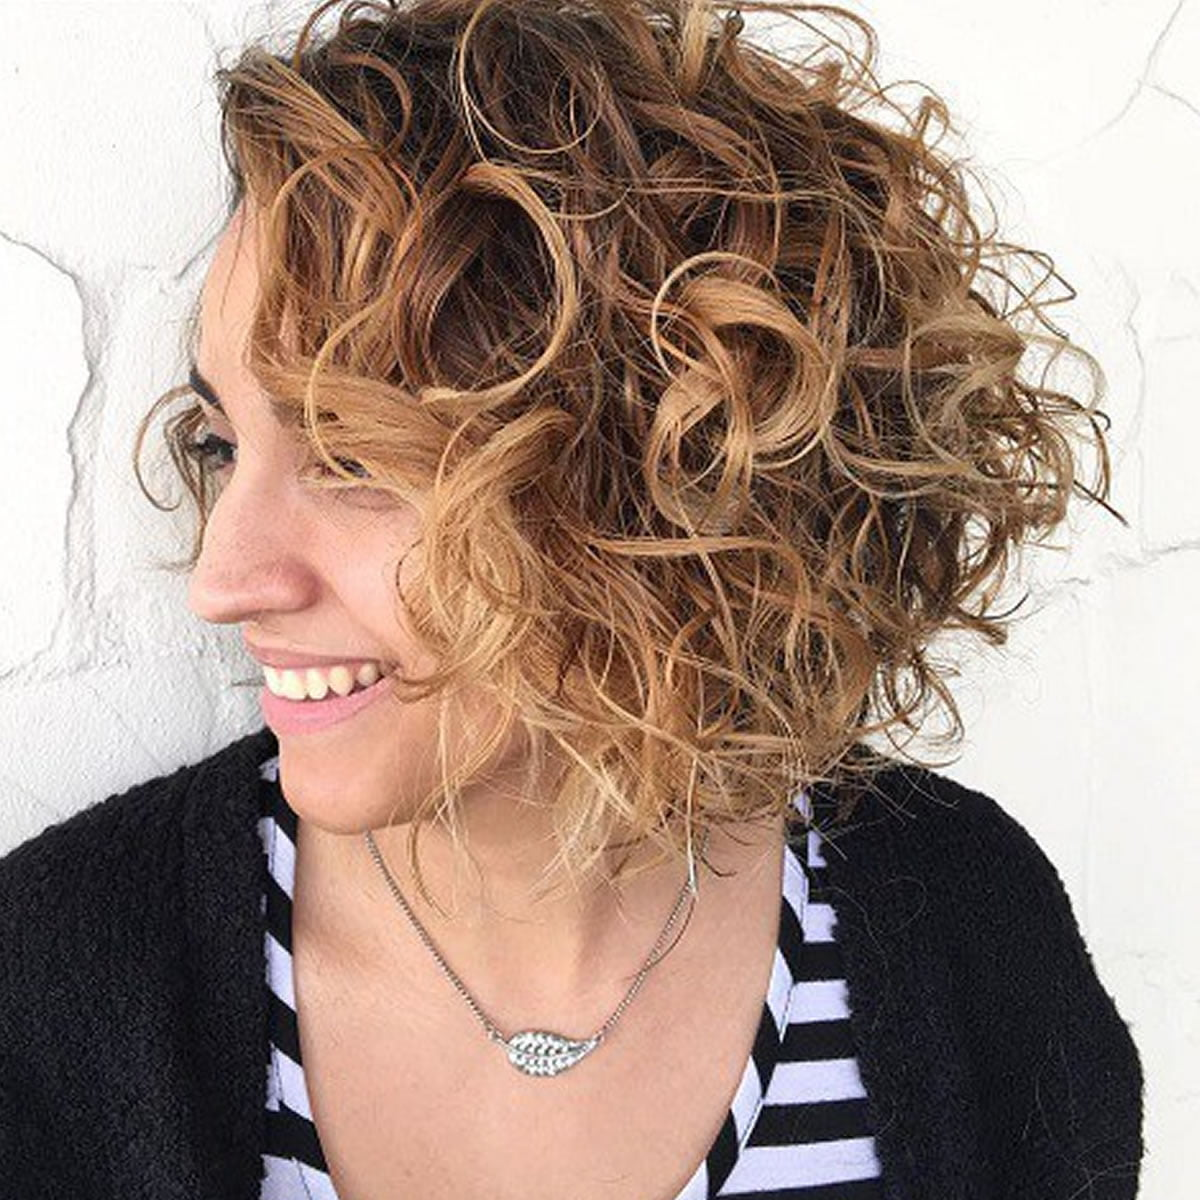 Curly Bob Hairstyles for Women Autumn & Winter Short Hair 2017 ...